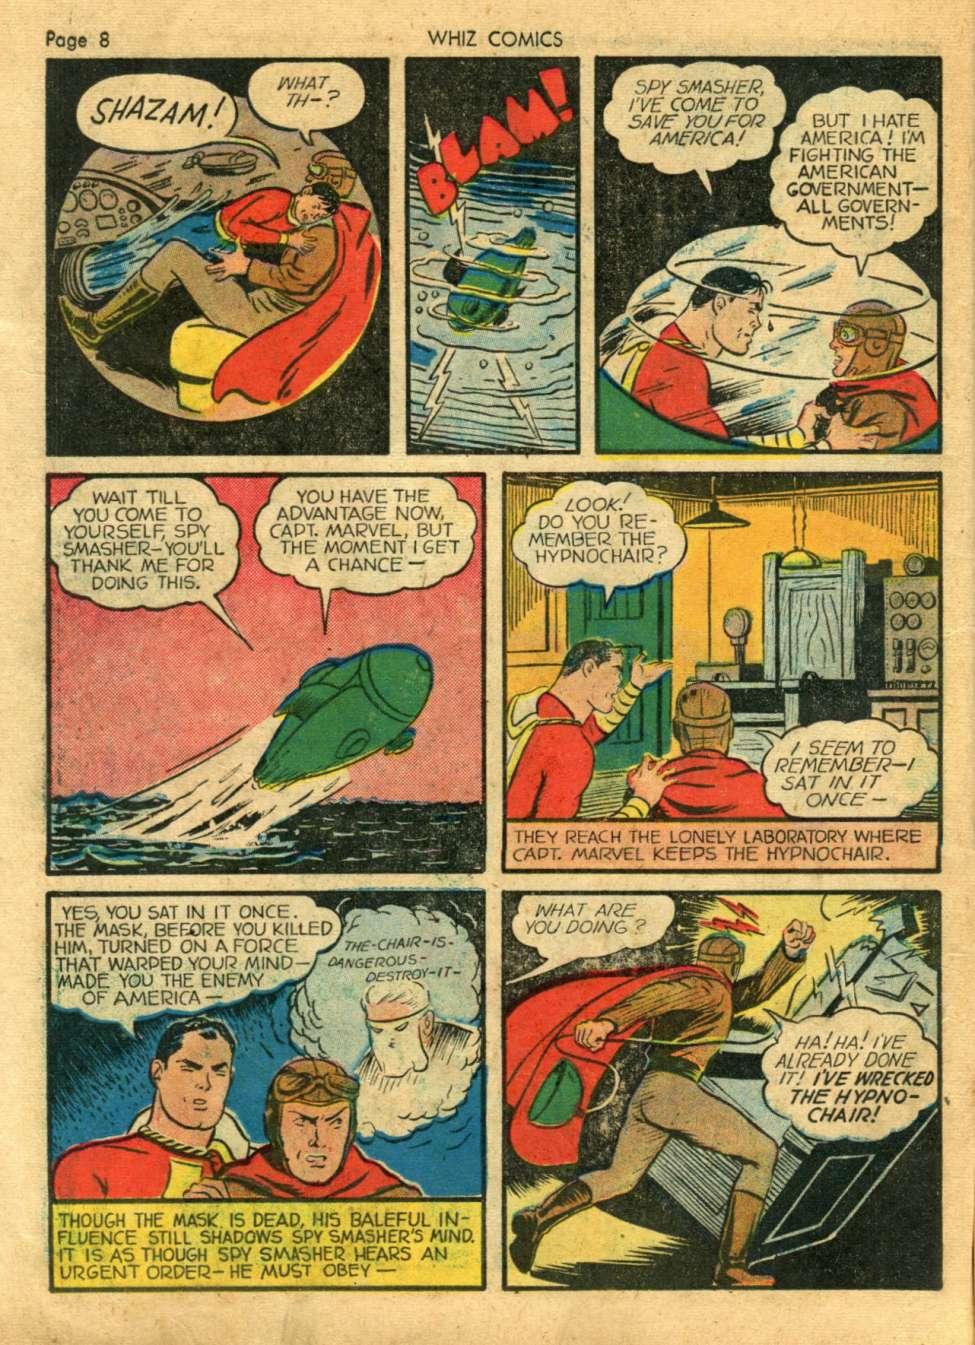 Comic Book Cover For Whiz Comics #18